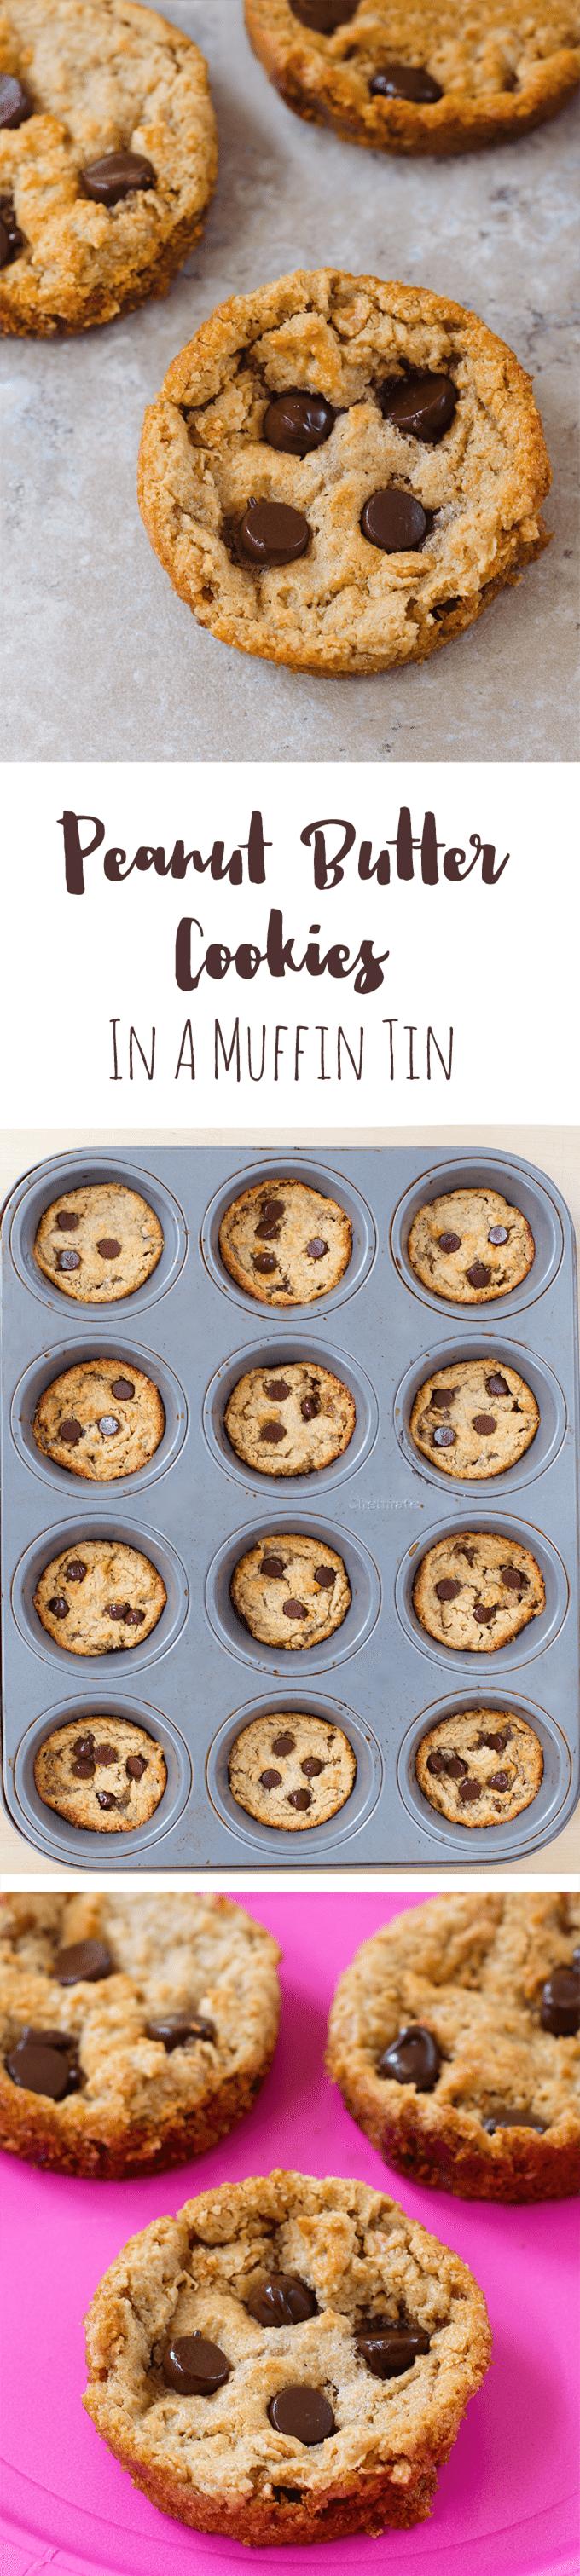 Peanut Butter Cookies - Ingredients: 1/2 cup peanut butter, 1/2 tsp vanilla extract, 1/4 tsp baking soda, 2 tbsp... Full recipe: http://chocolatecoveredkatie.com/2016/08/01/peanut-butter-cookies-muffin-tin/ @choccoveredkt